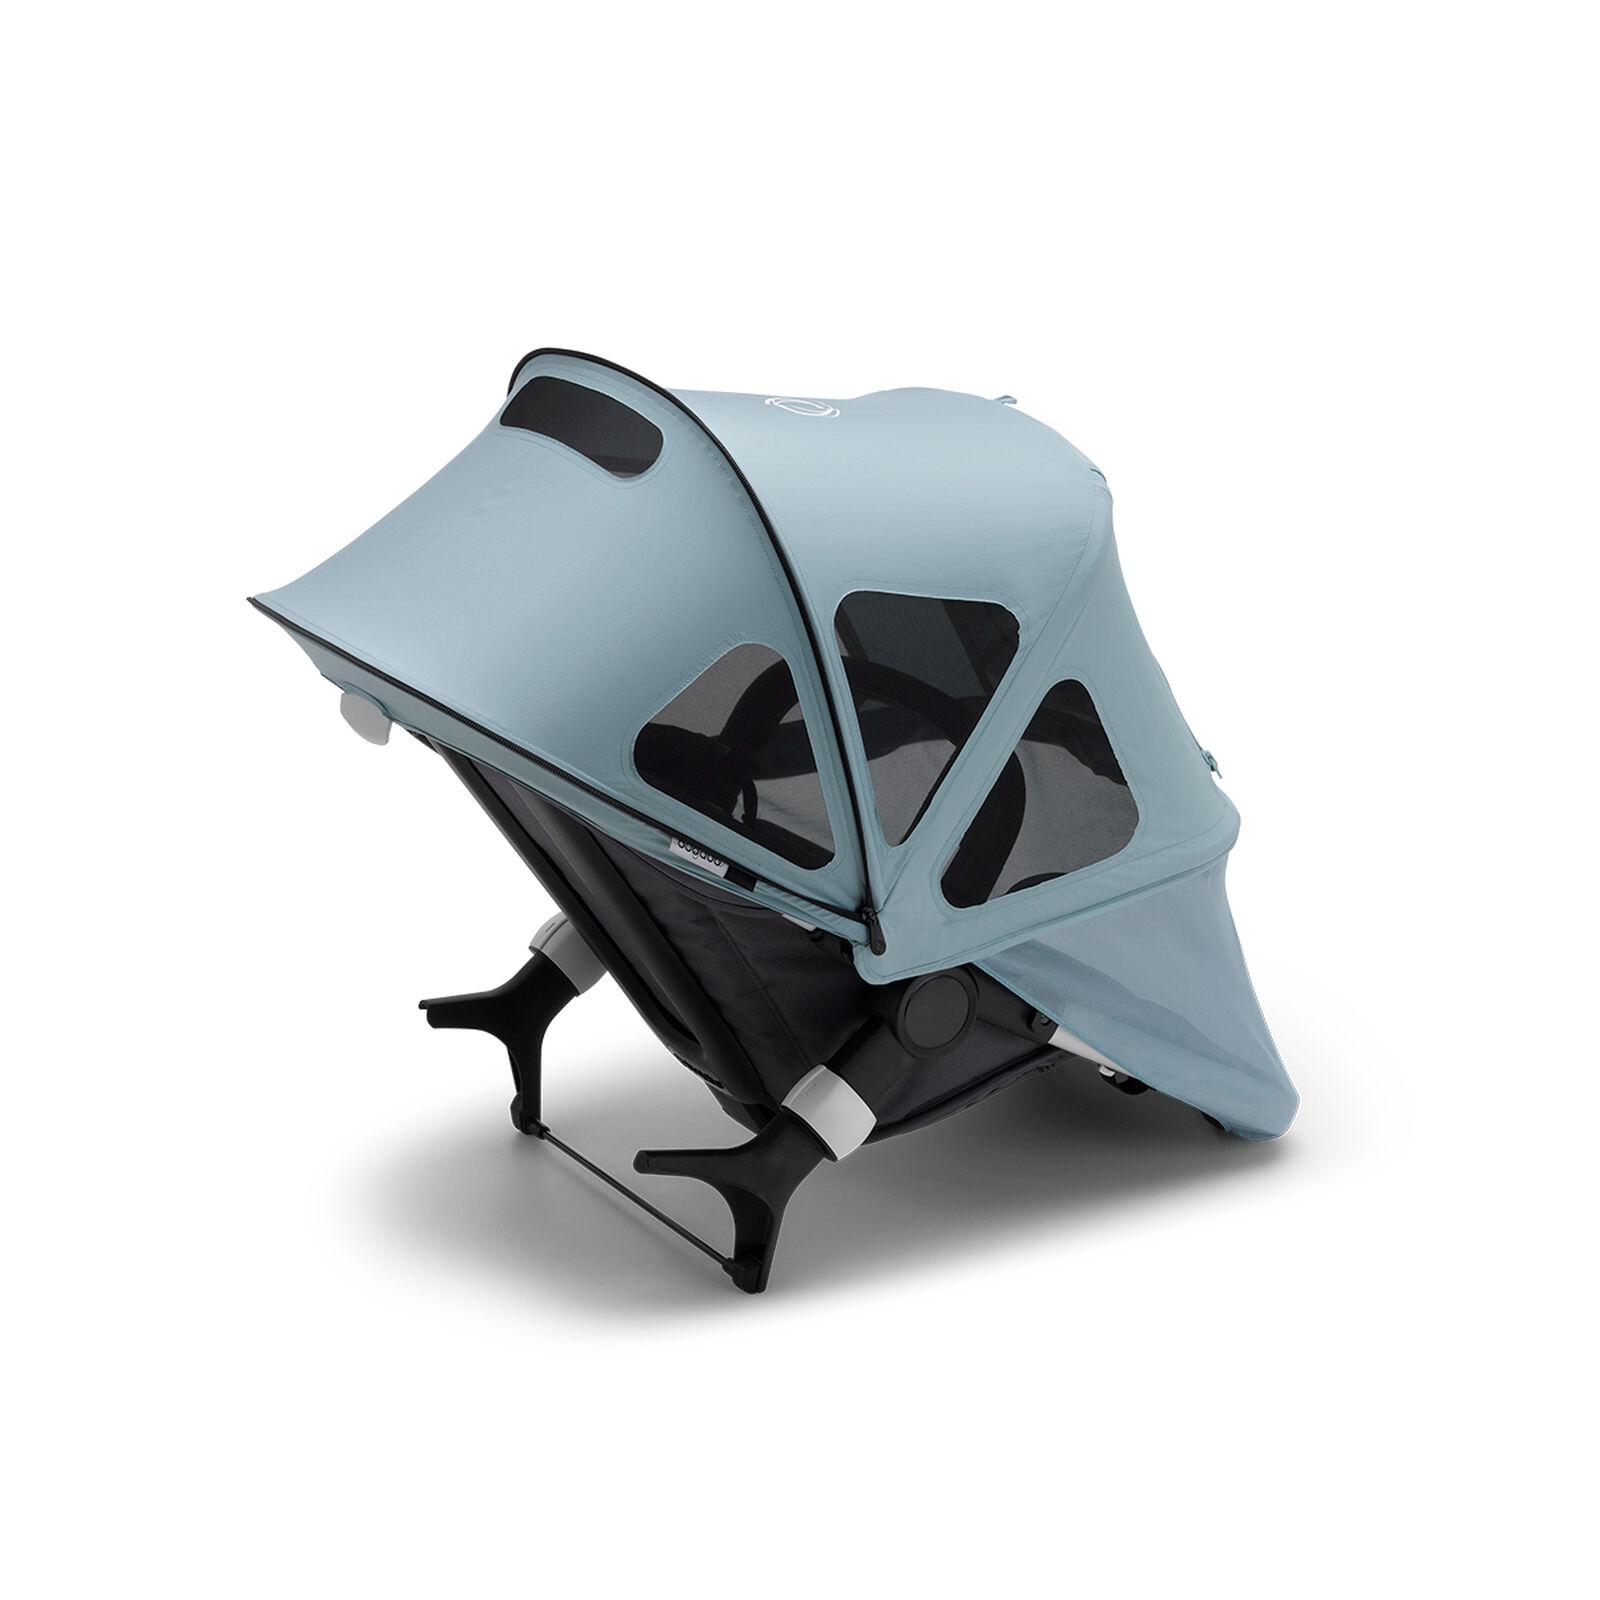 Bugaboo Fox 2/Cameleon 3 breezy sun canopy